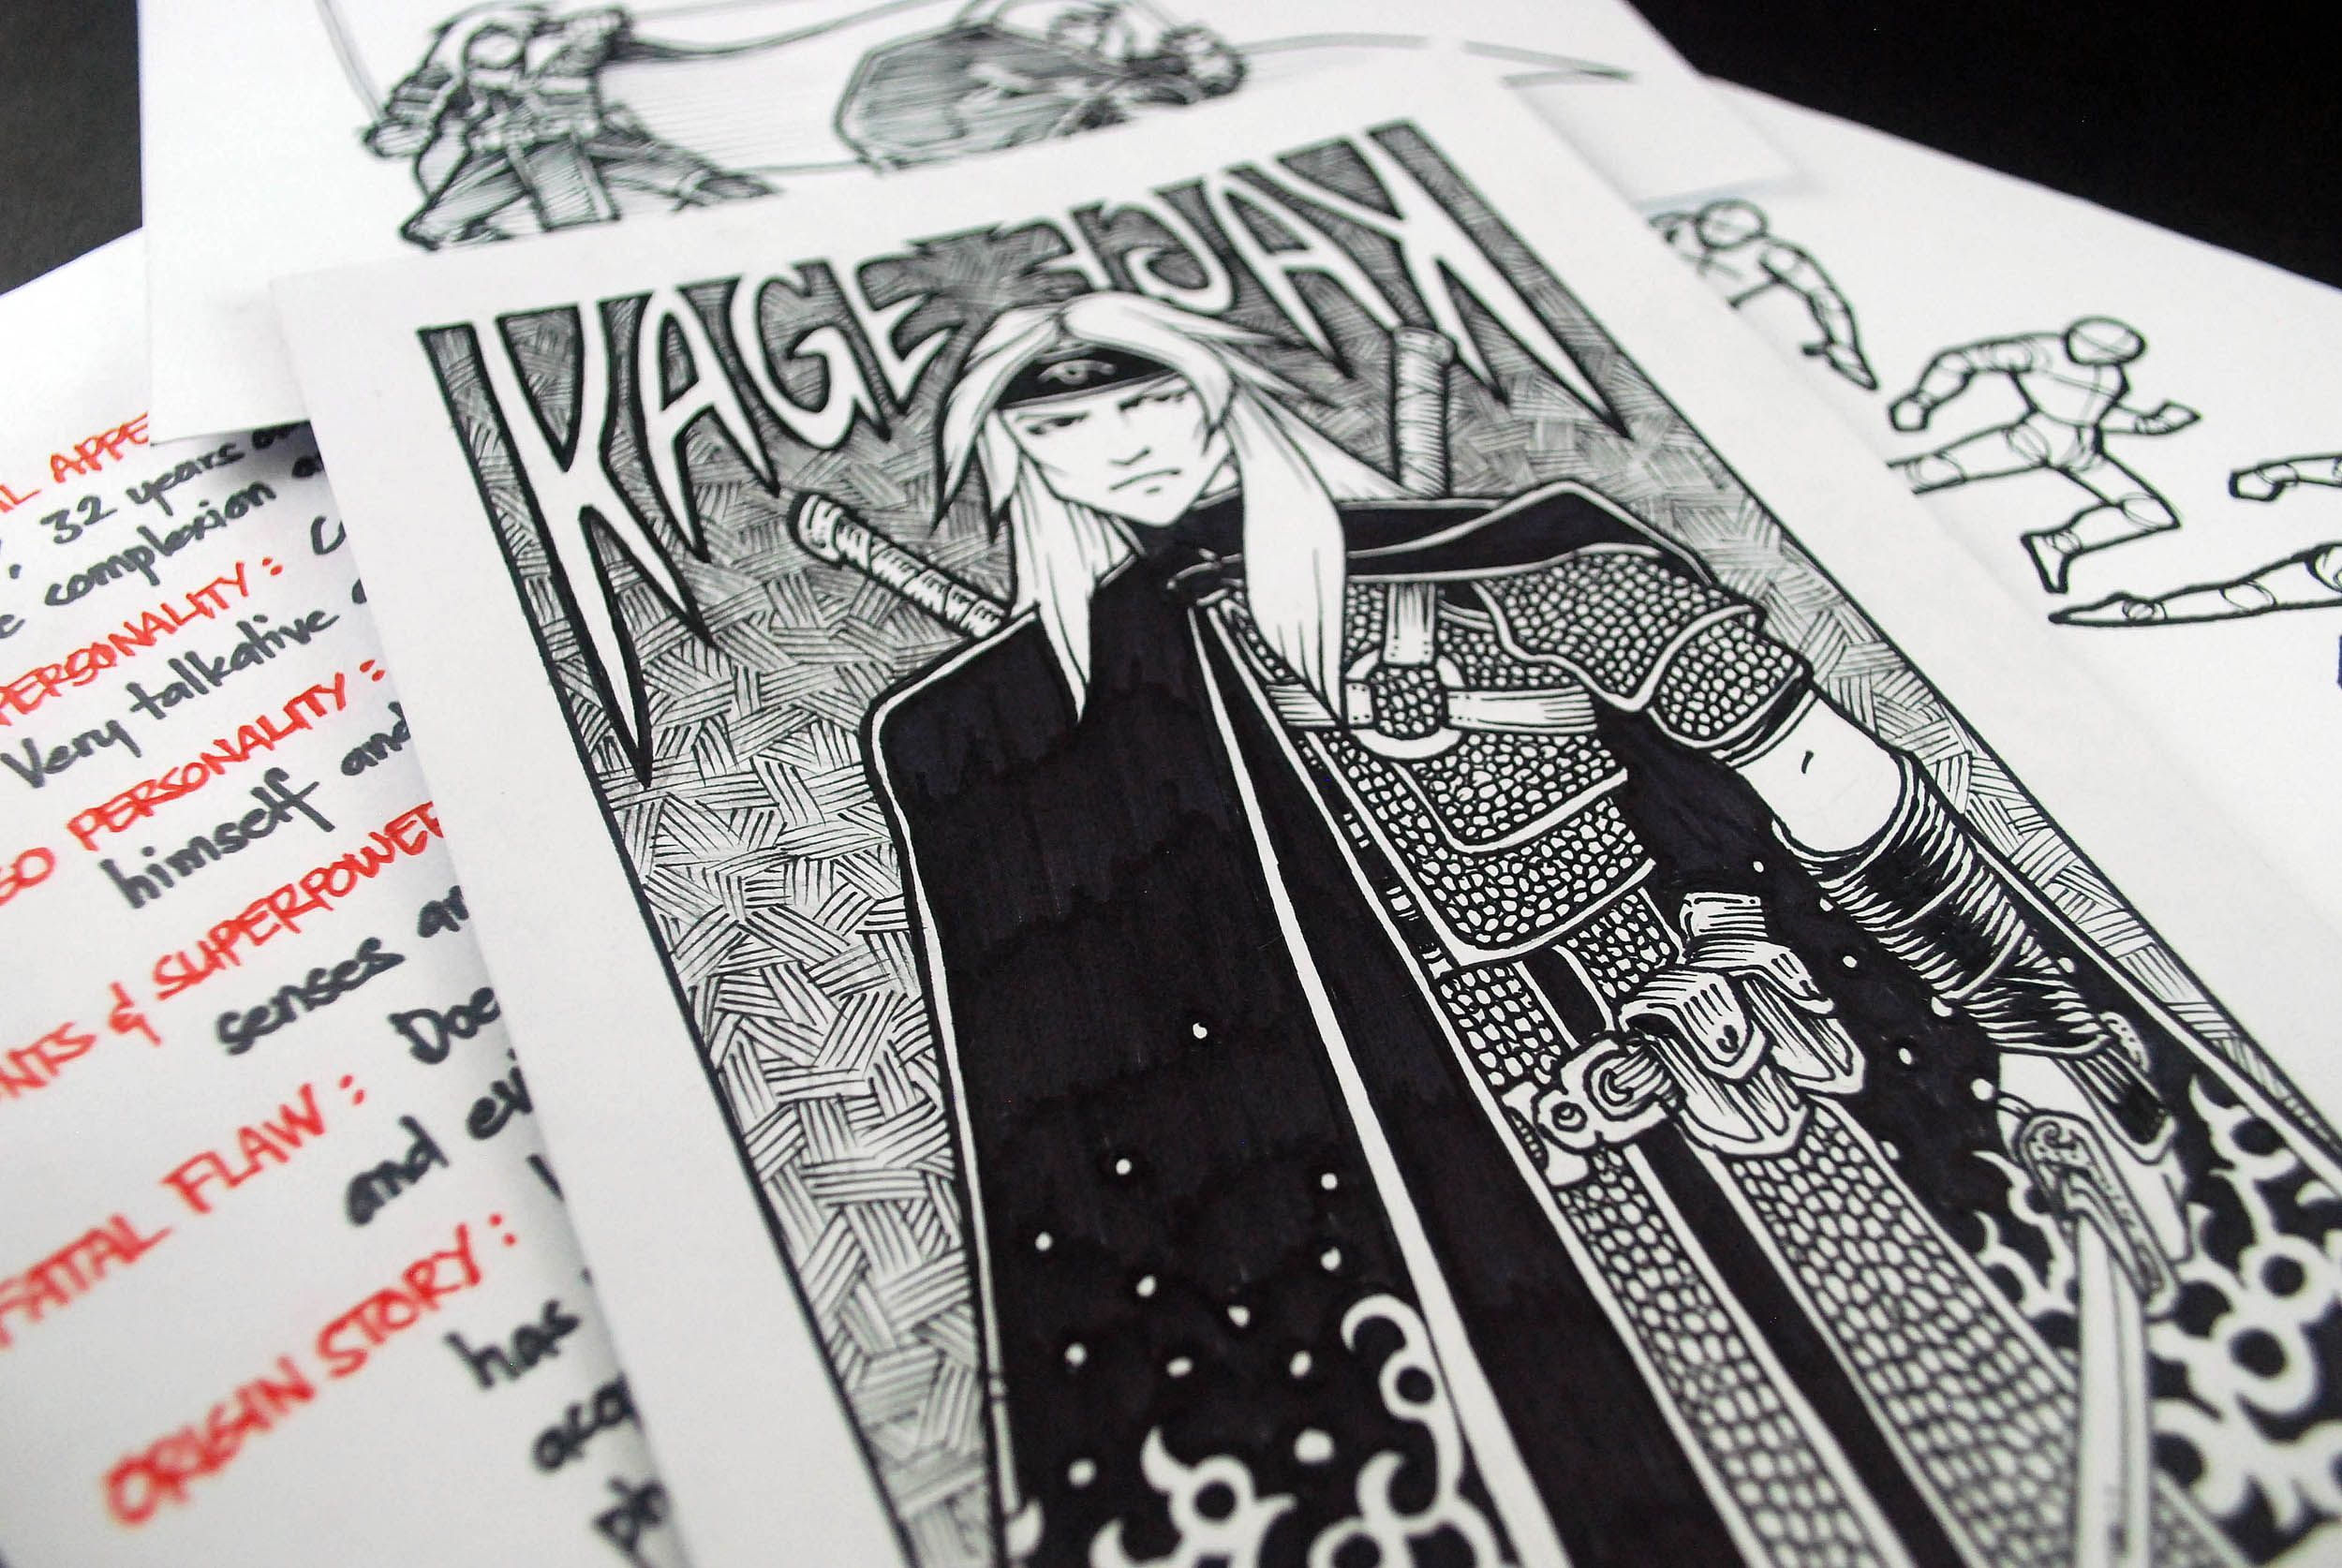 How To Make Your Own Anime Or Manga Character Via Wikihow Com Anime Drawing Books Manga Drawing Books Anime Character Design